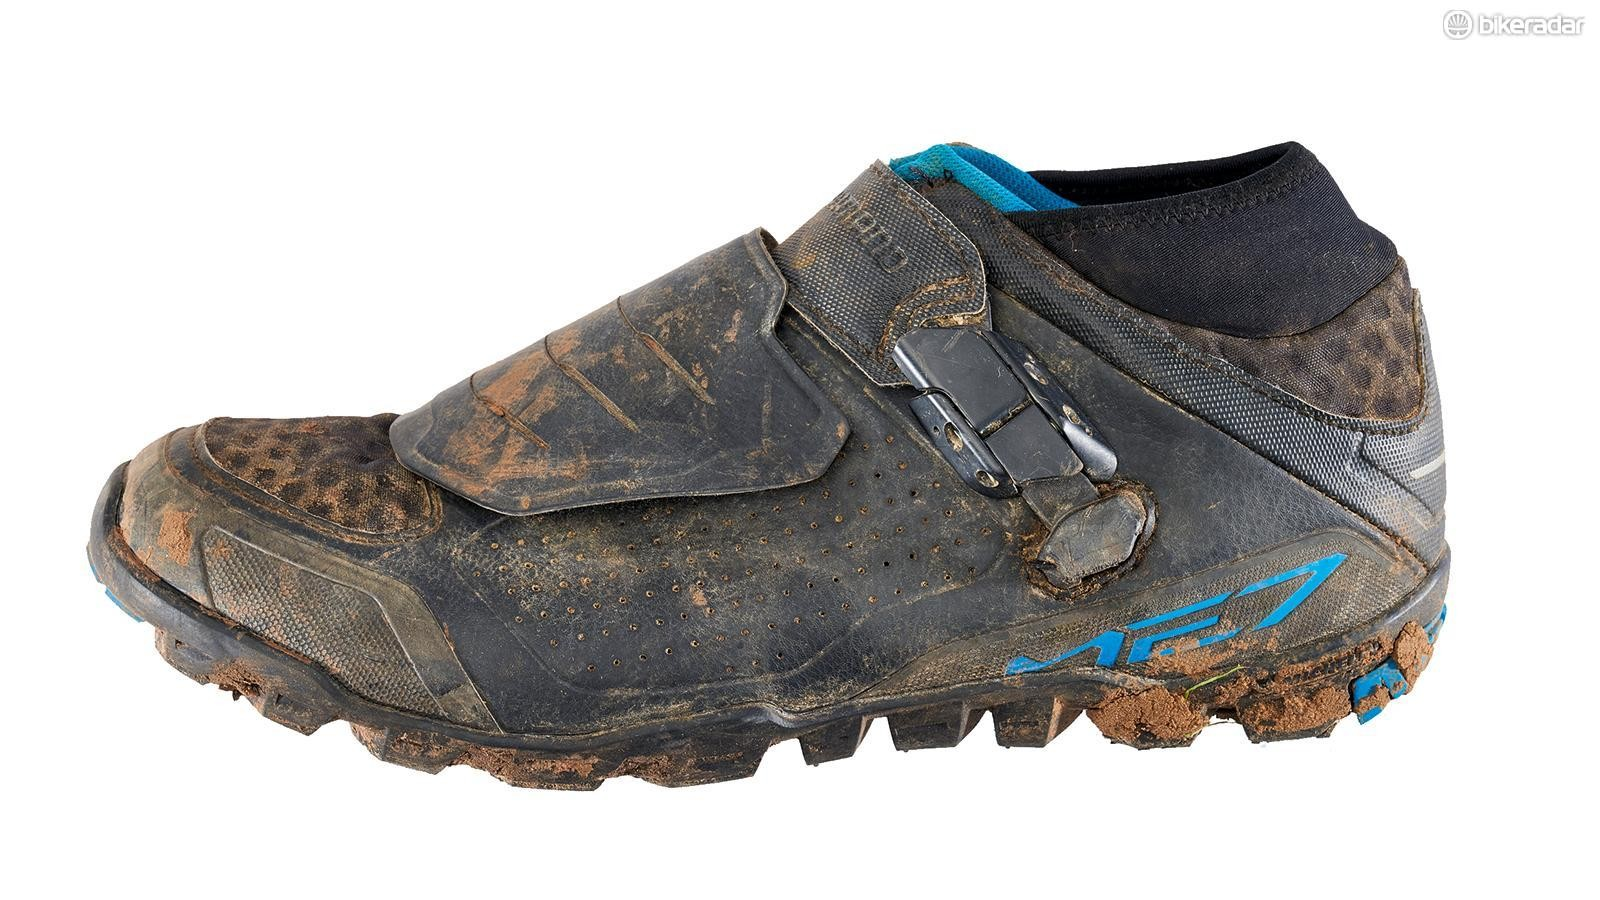 ae70743a27d Best shoes for mountain bikers - BikeRadar